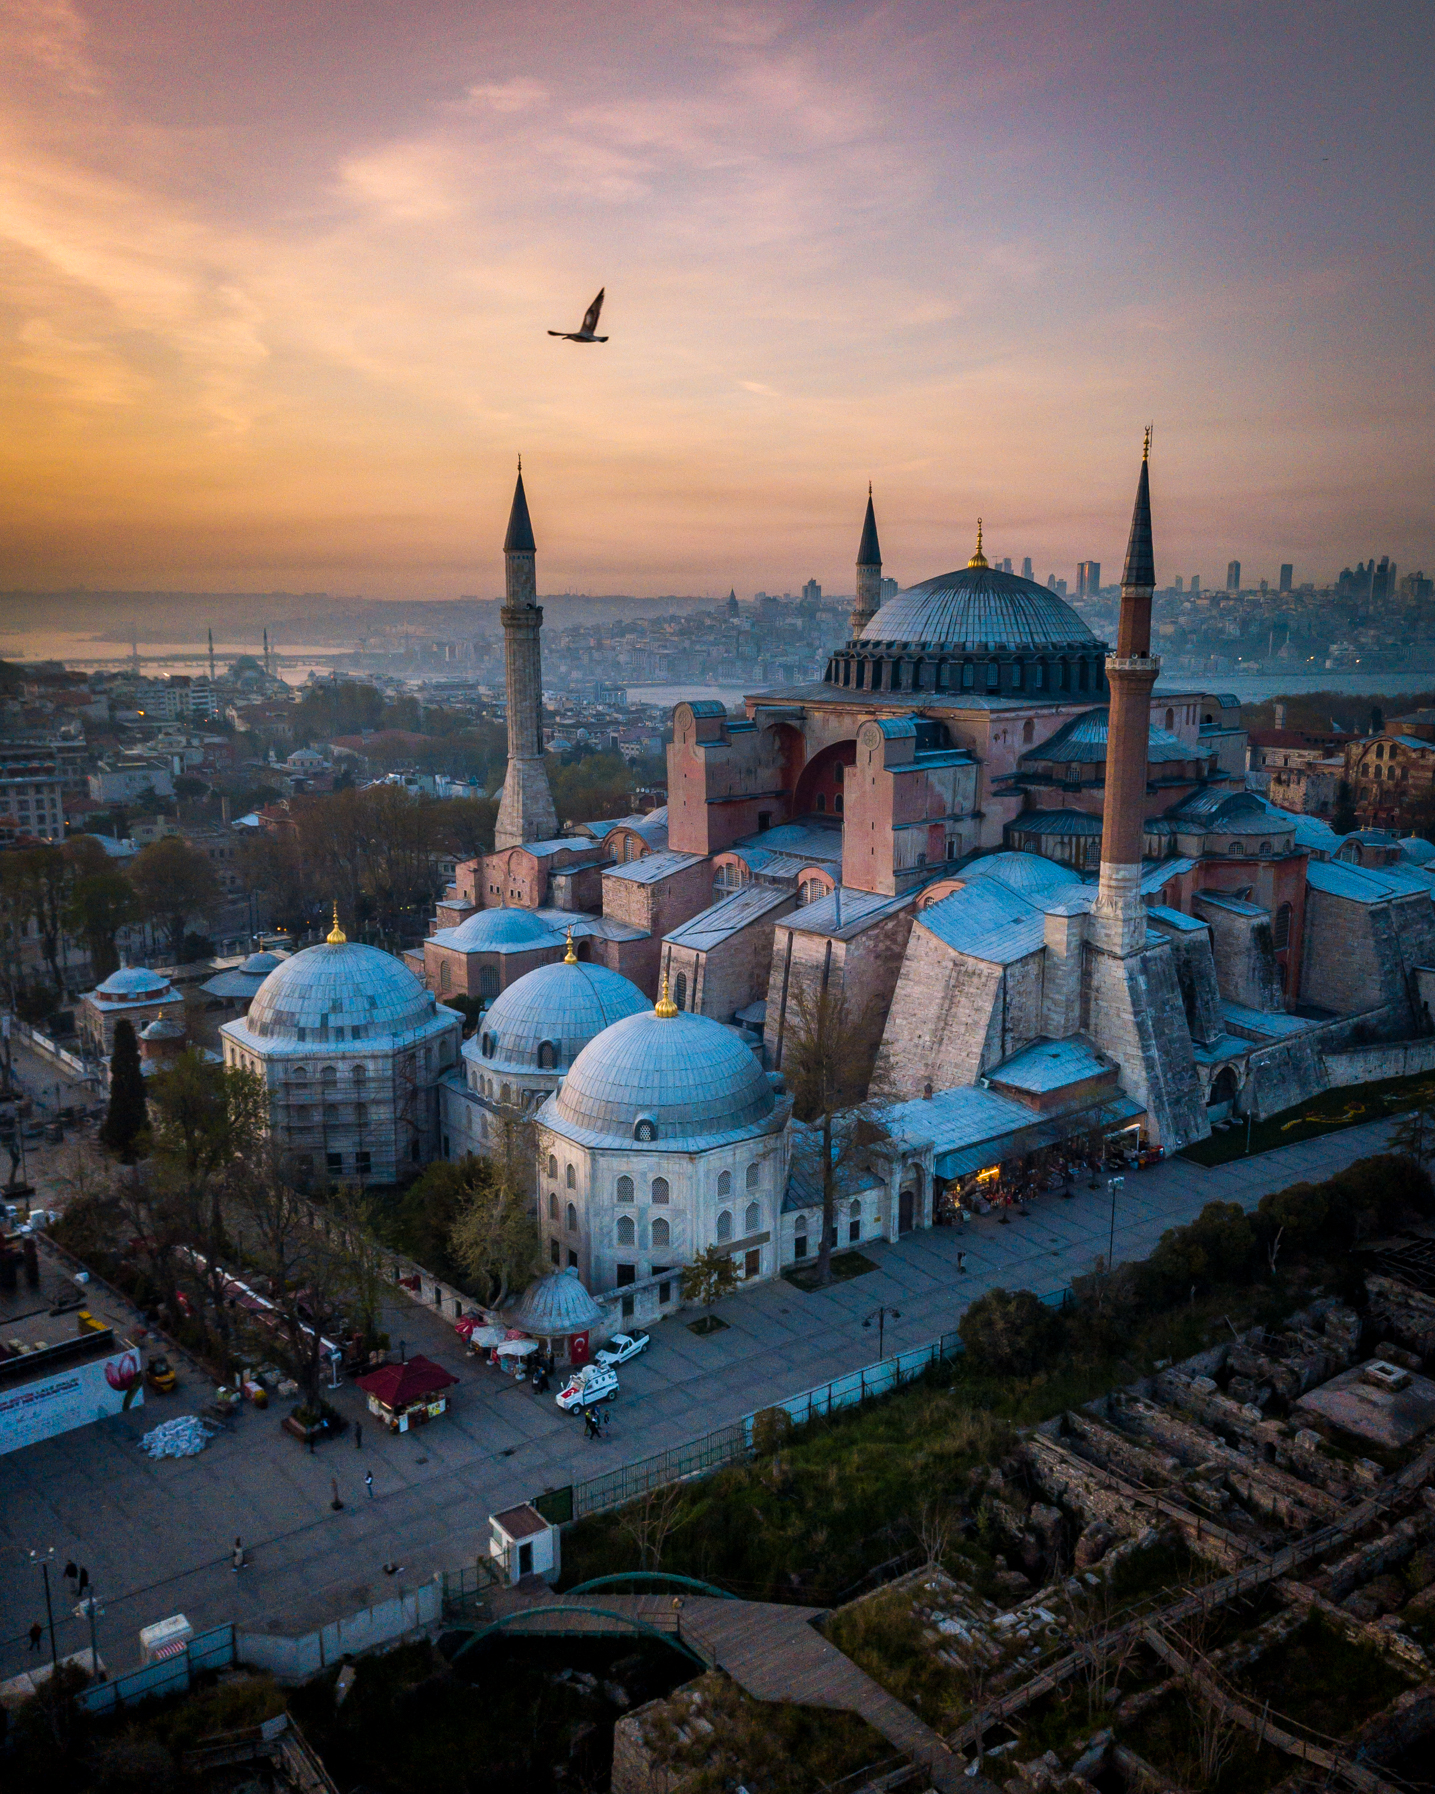 Hagia Sofia - Istanbul, Tureky